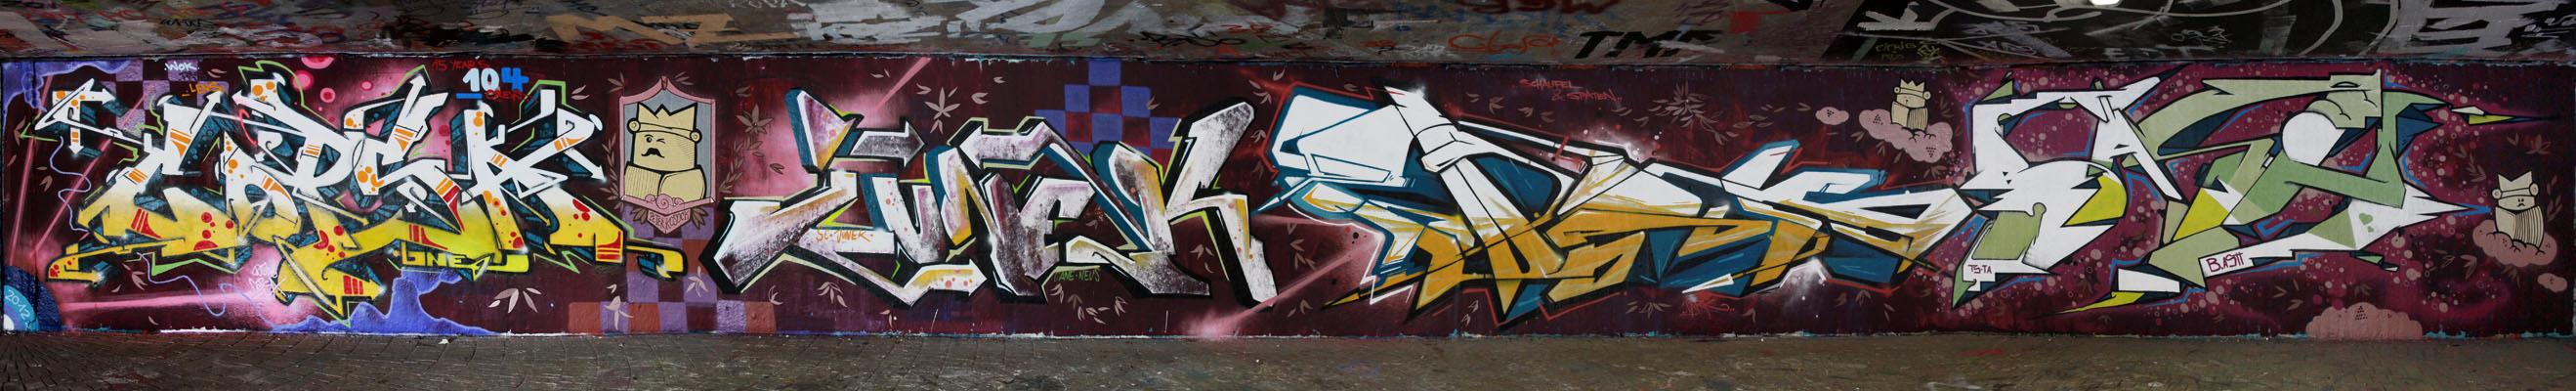 Copsa_PeterKosock_Junek_Park_B.ash_2012